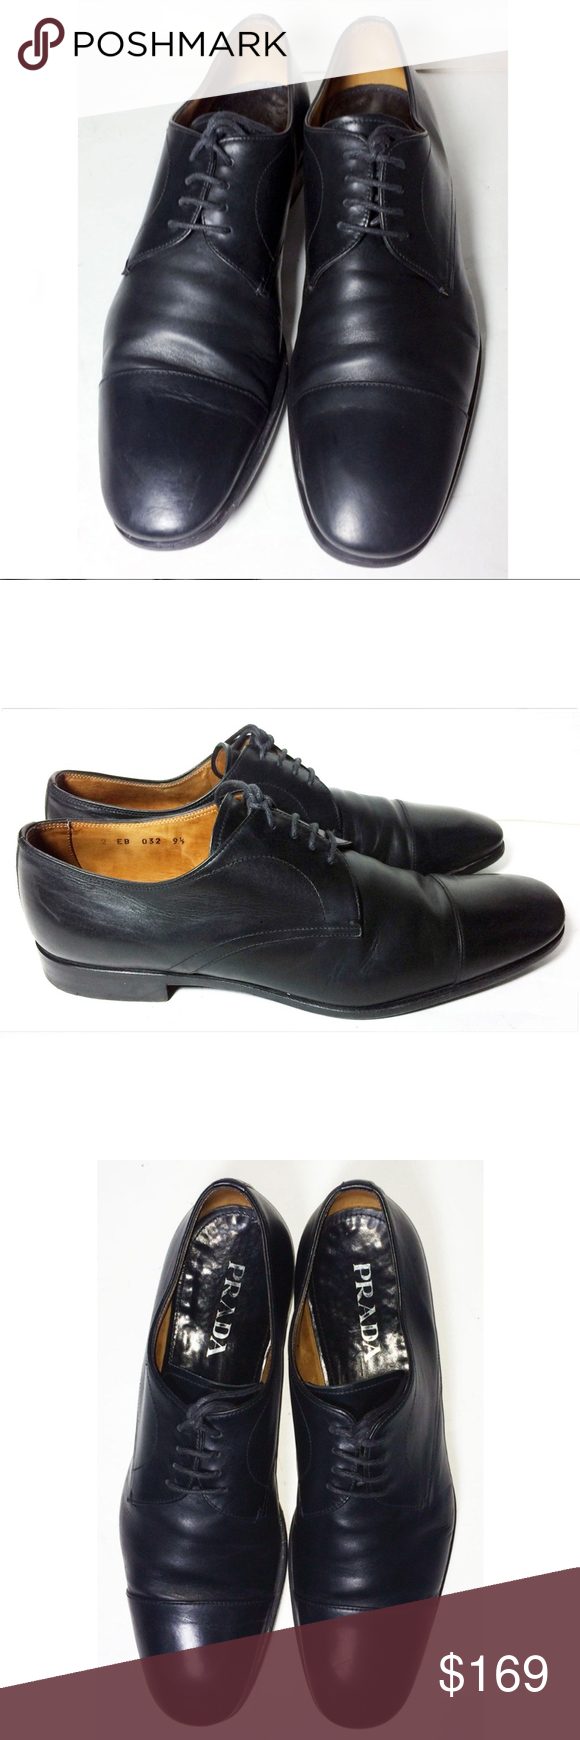 Prada Black Derby Cape Toe Dress Shoe Men Size 9.5 Prada Black Leather Derby Cap…